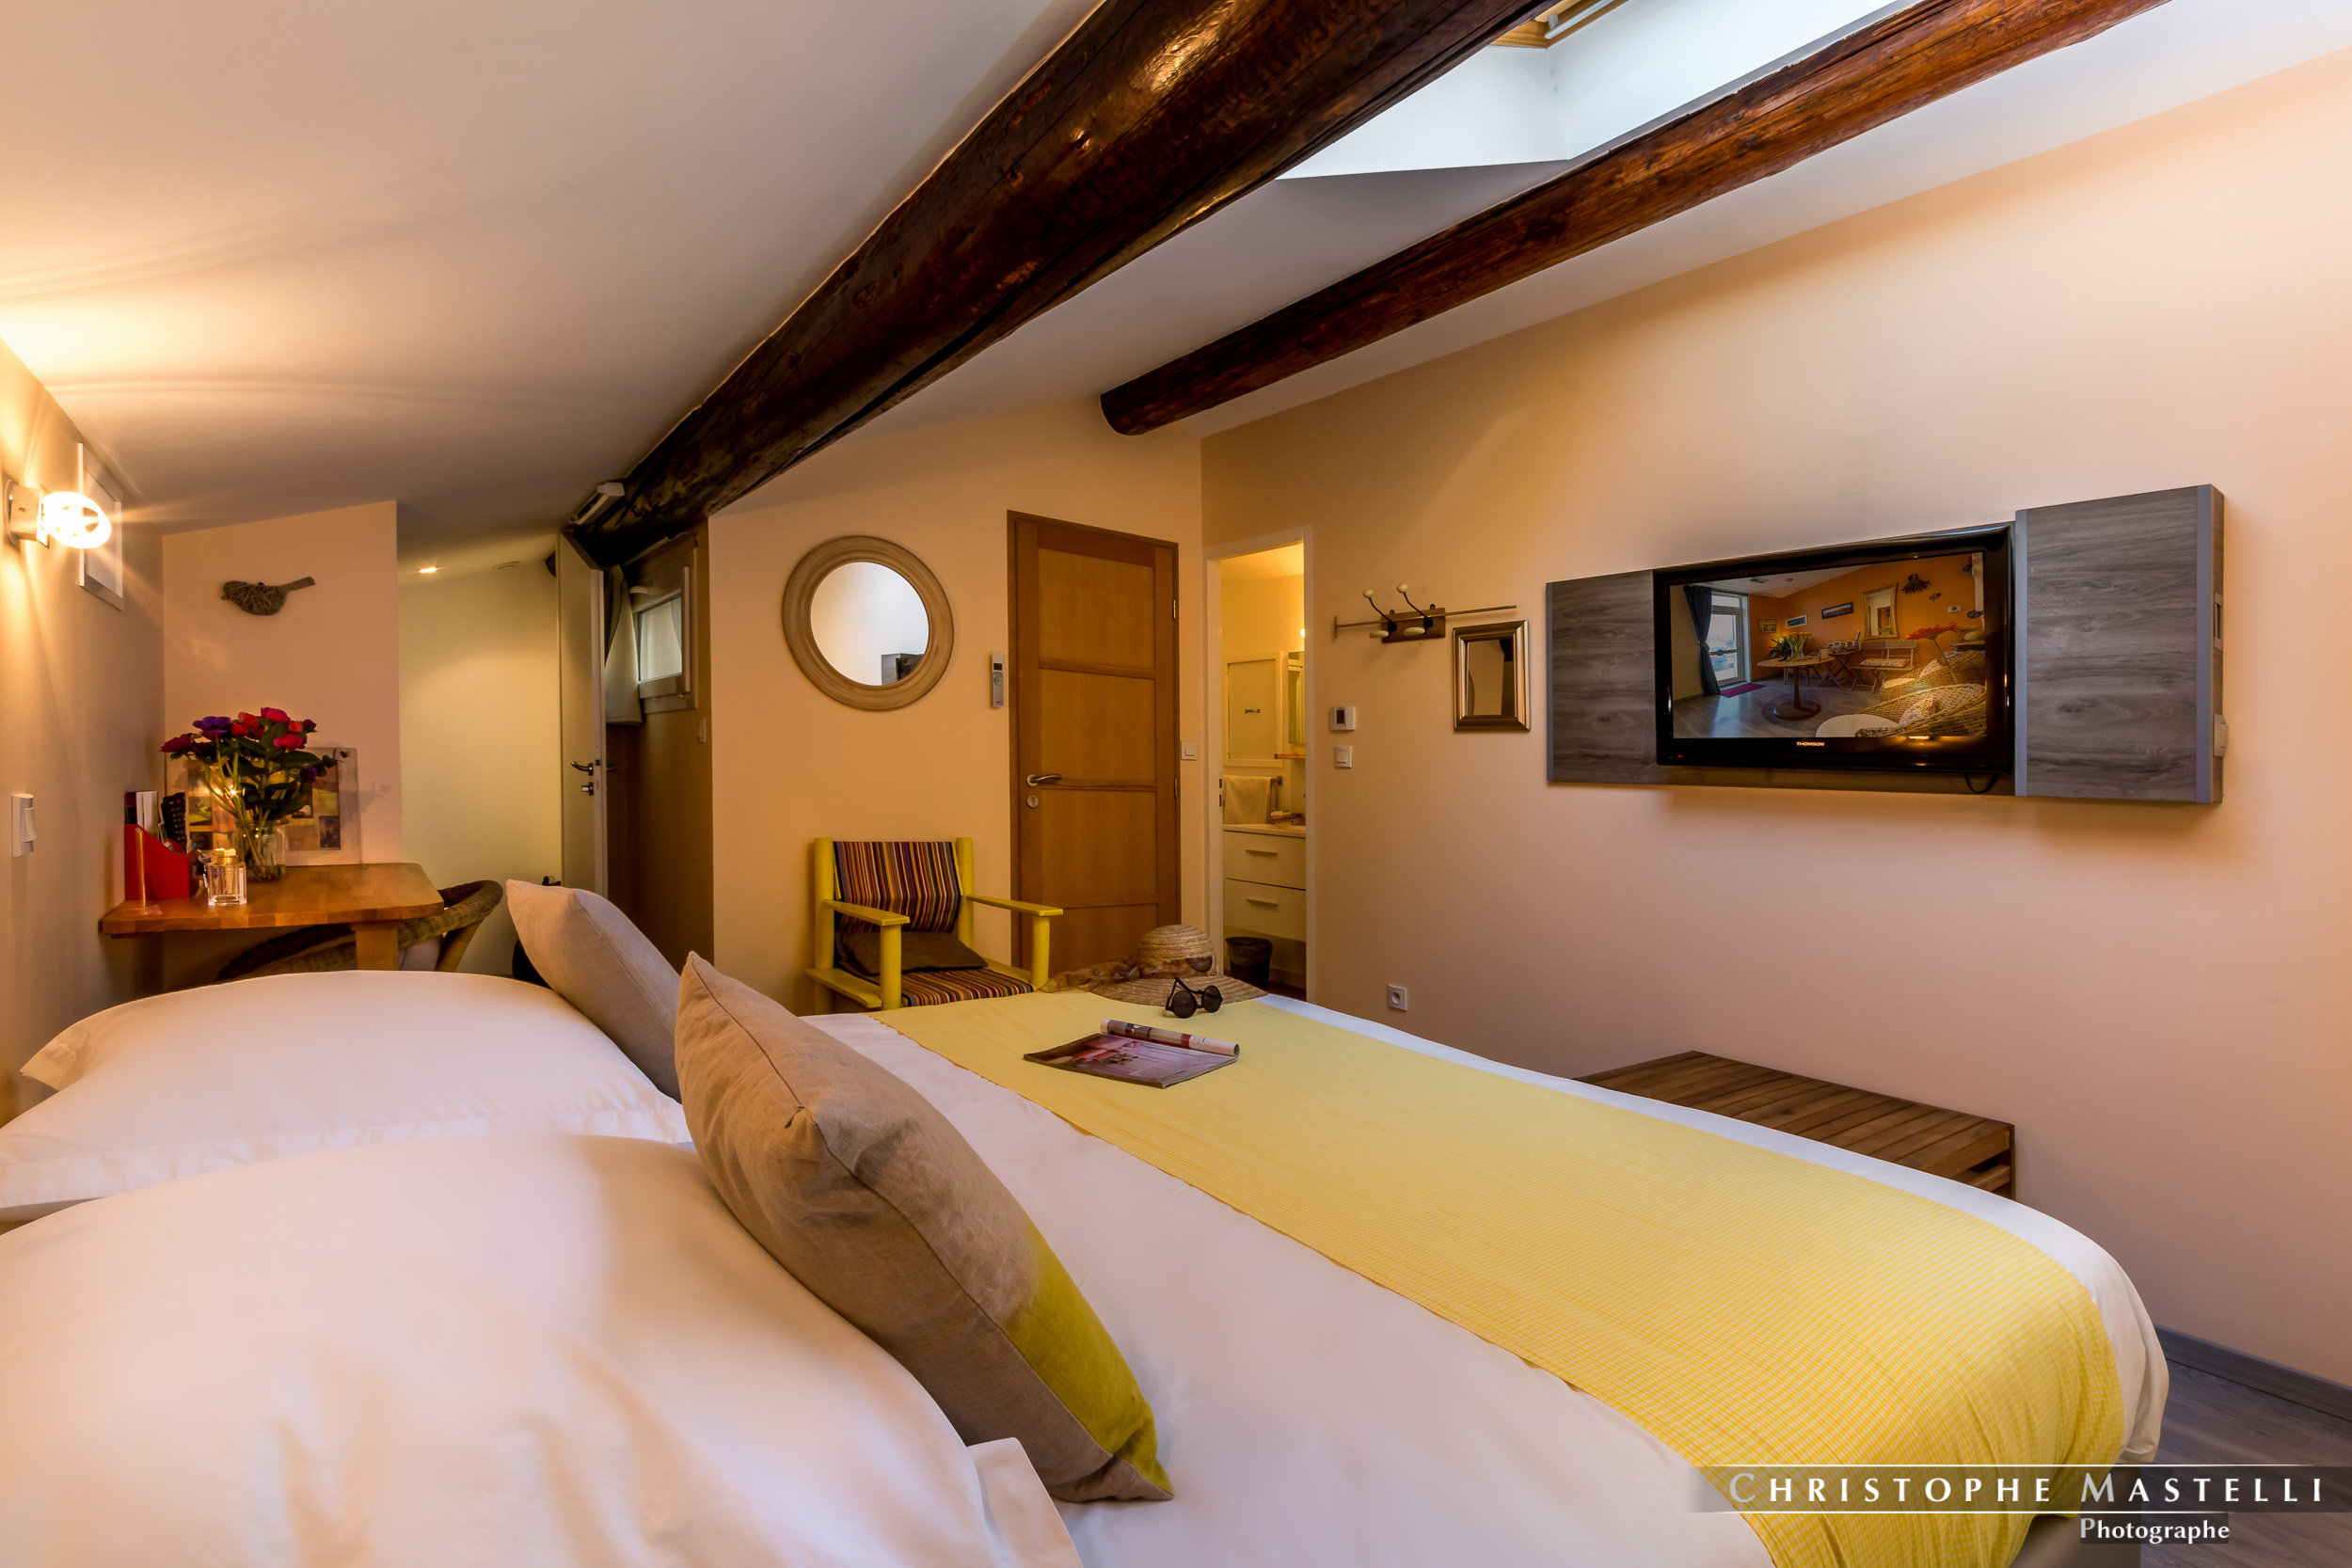 christophe mastelli photographie hotel restaurants